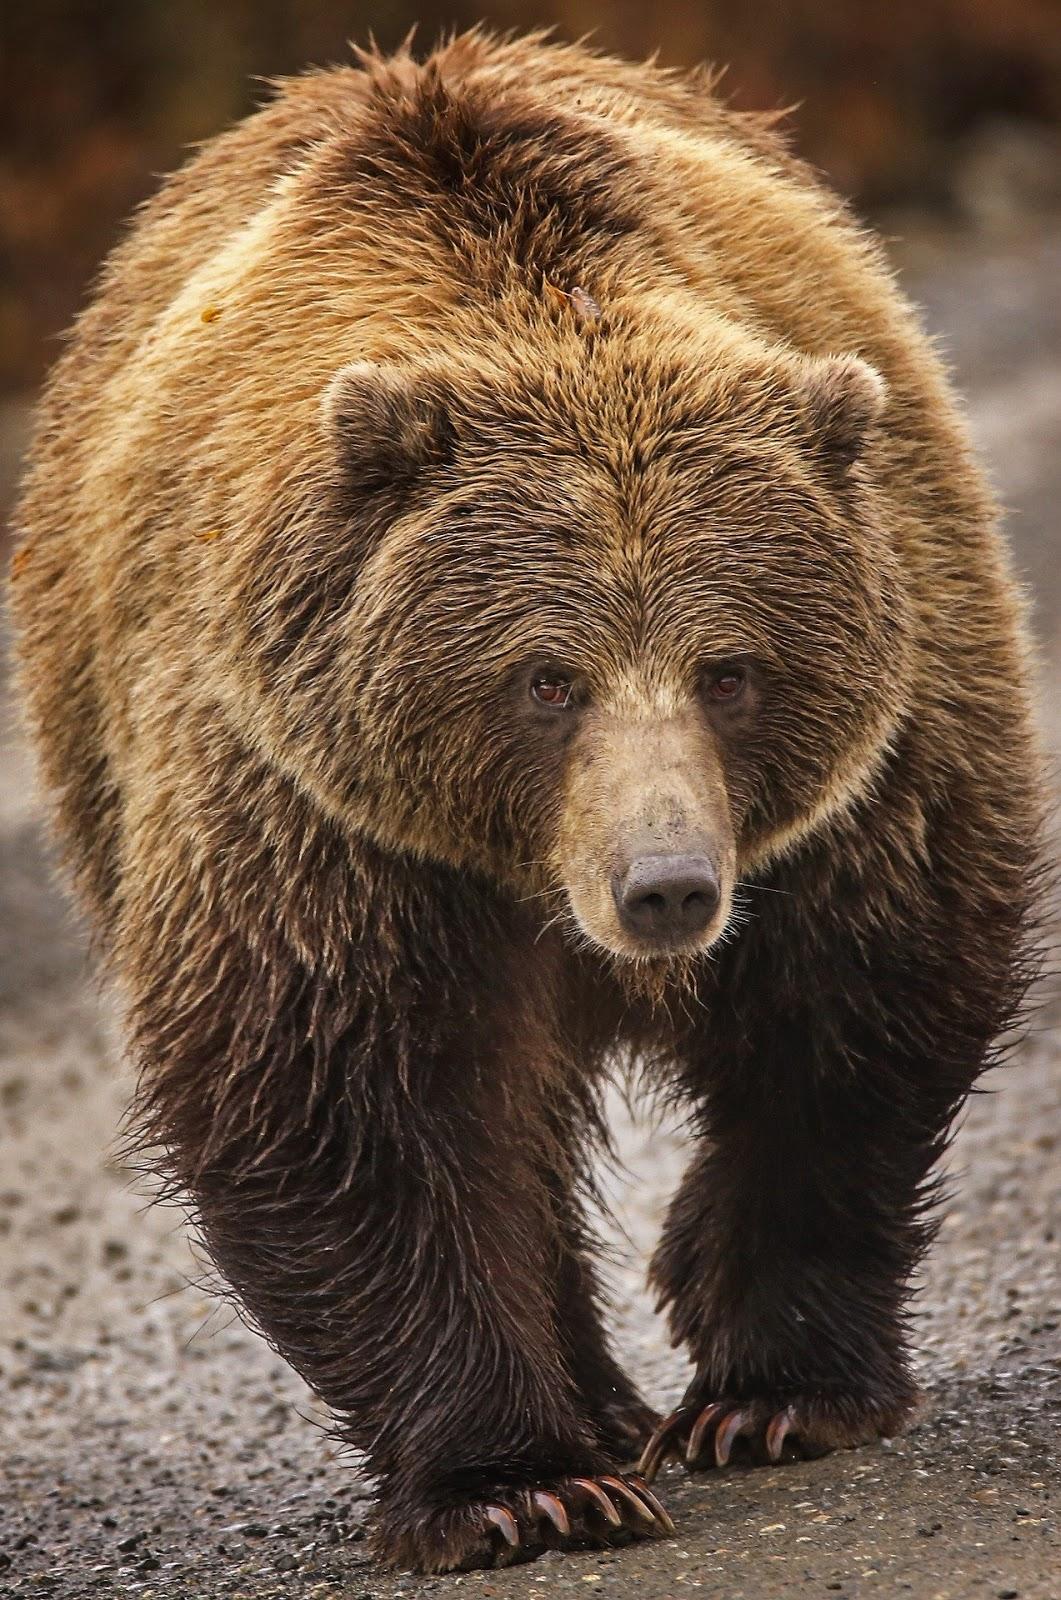 A wet bear with fuzzy hair coat.